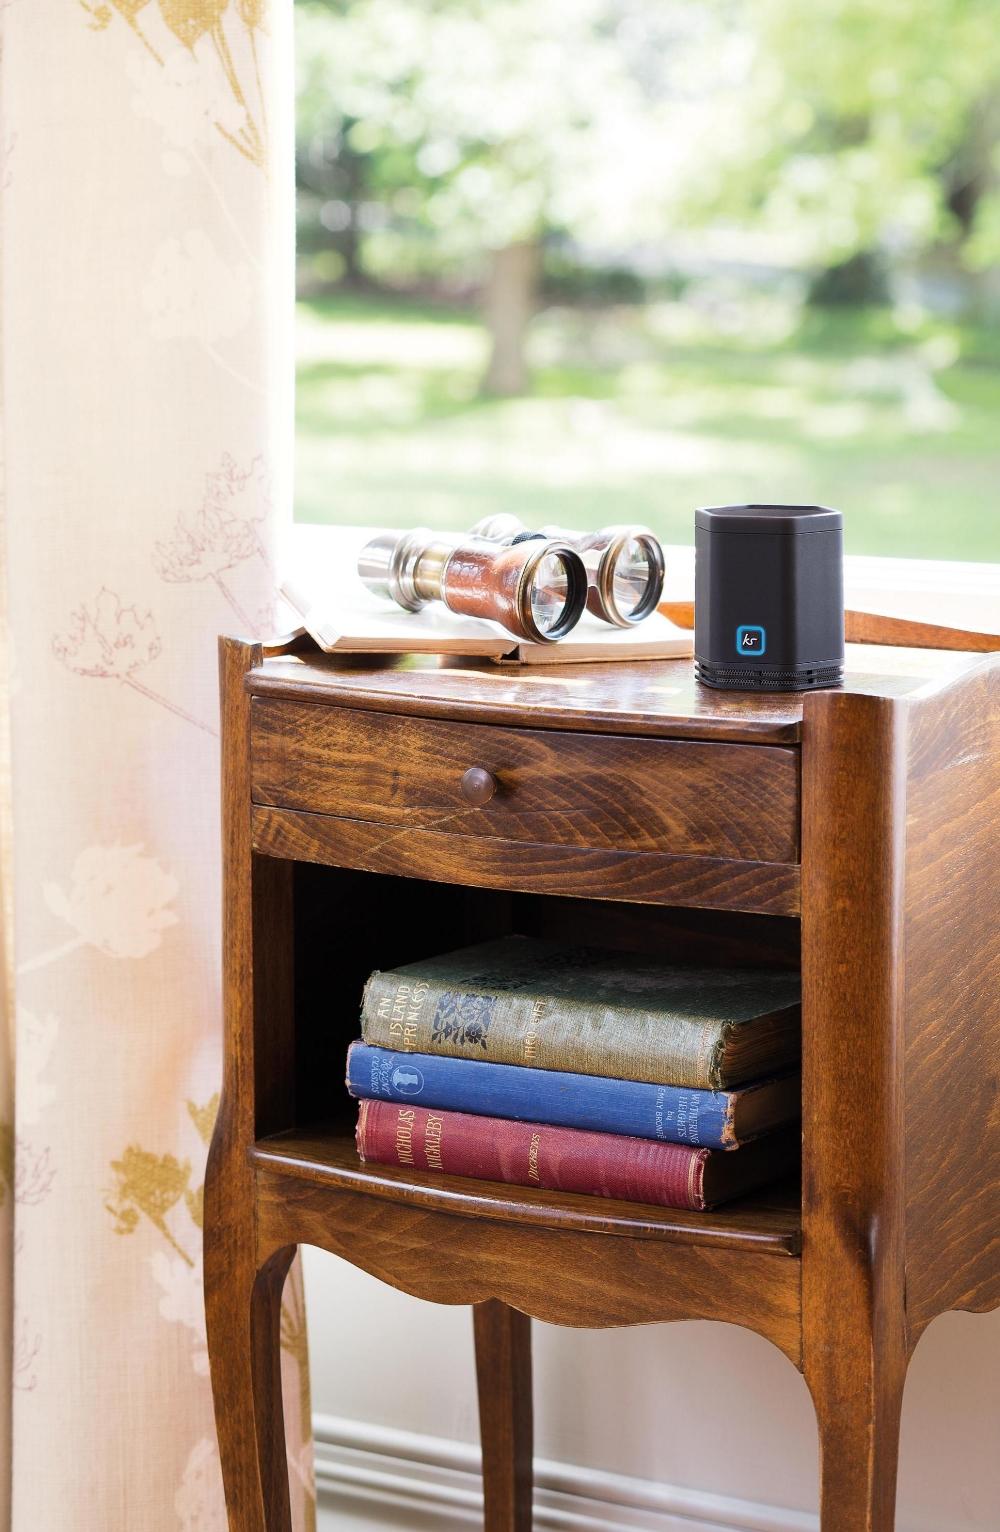 Boxa portabila KitSound Hive cu bluetooth si NFC + casca cu fir stereo KitSound Hive cu buton de raspuns pe fir, Pachet bundle KSEVBUNRG 1